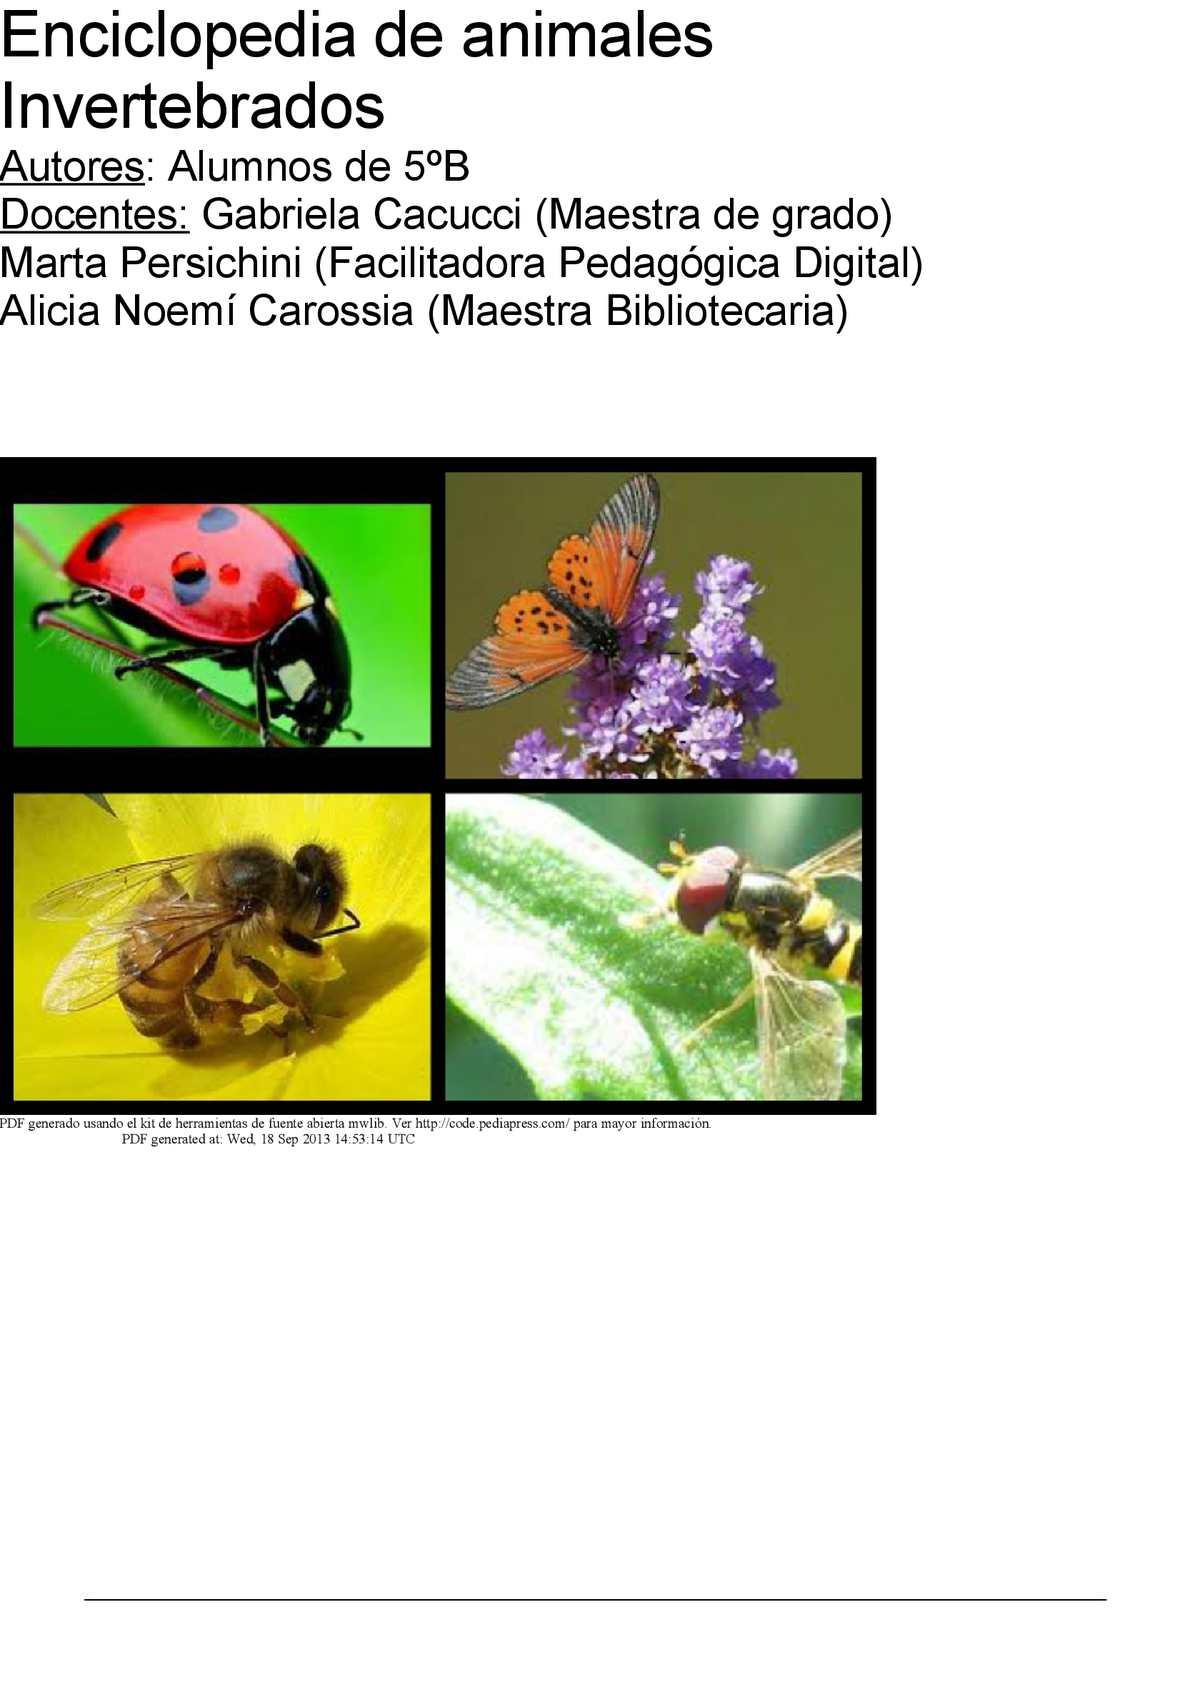 Calaméo - Enciclopedia de animales invertebrados